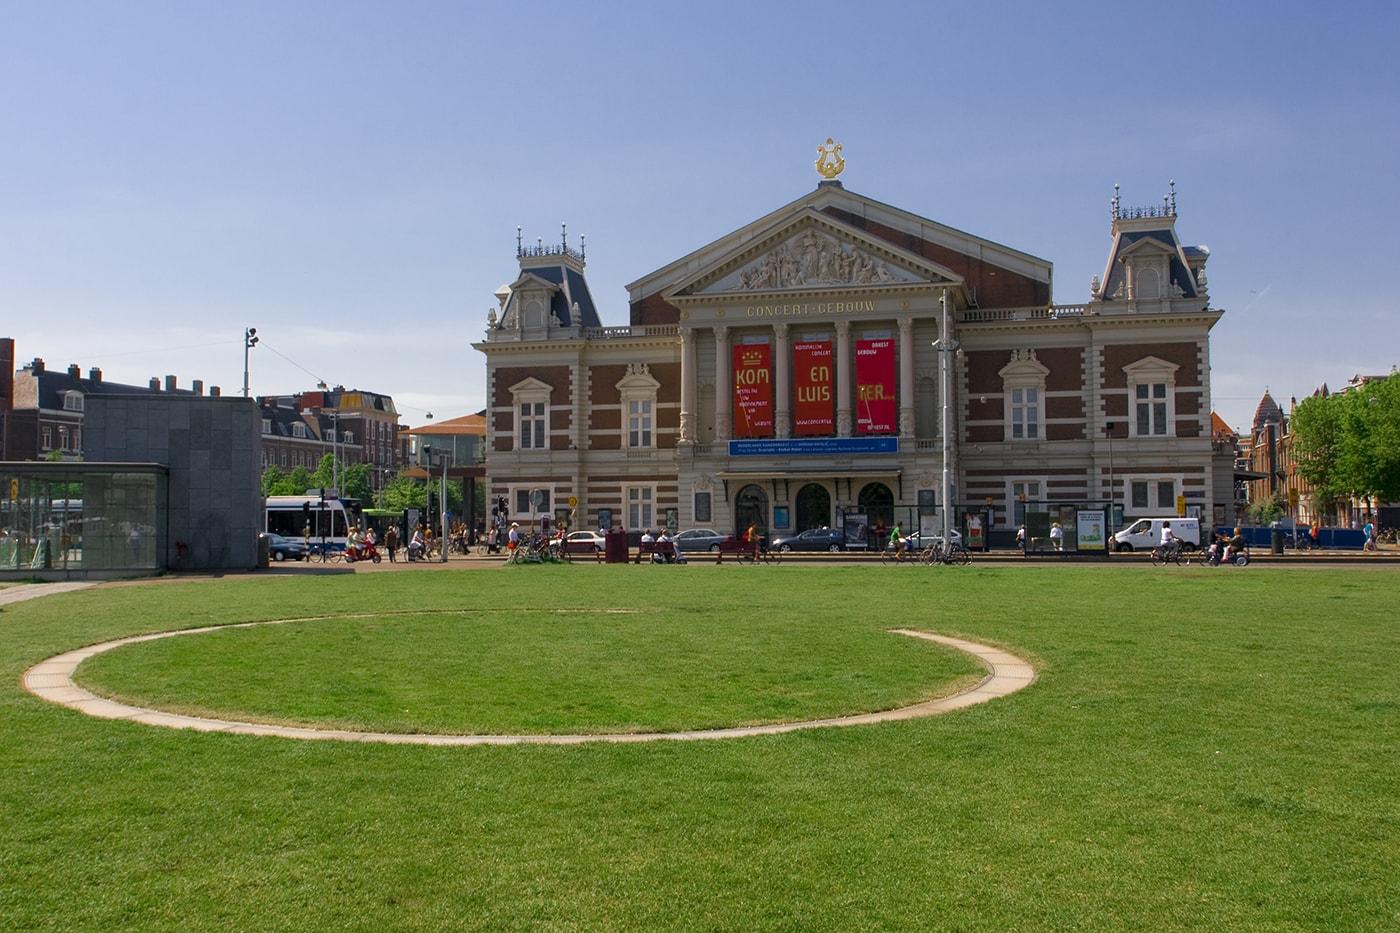 Concertgebau in Amsterdam, The Netherlands.